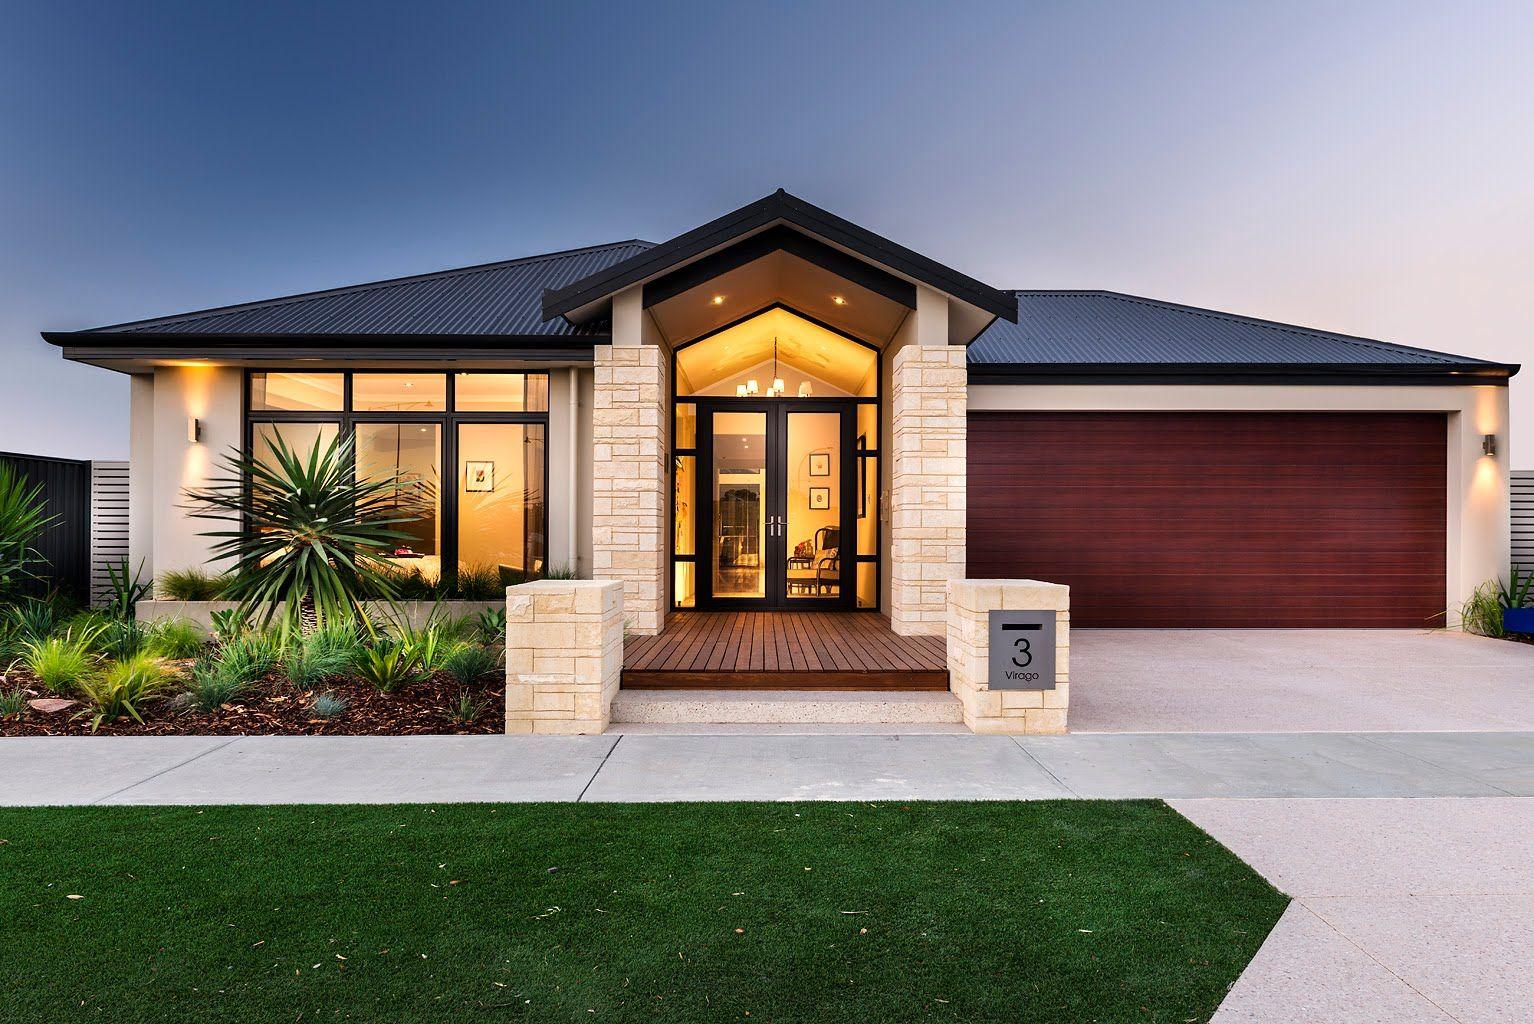 Eden Modern New Home Designs Dale Alcock Homes